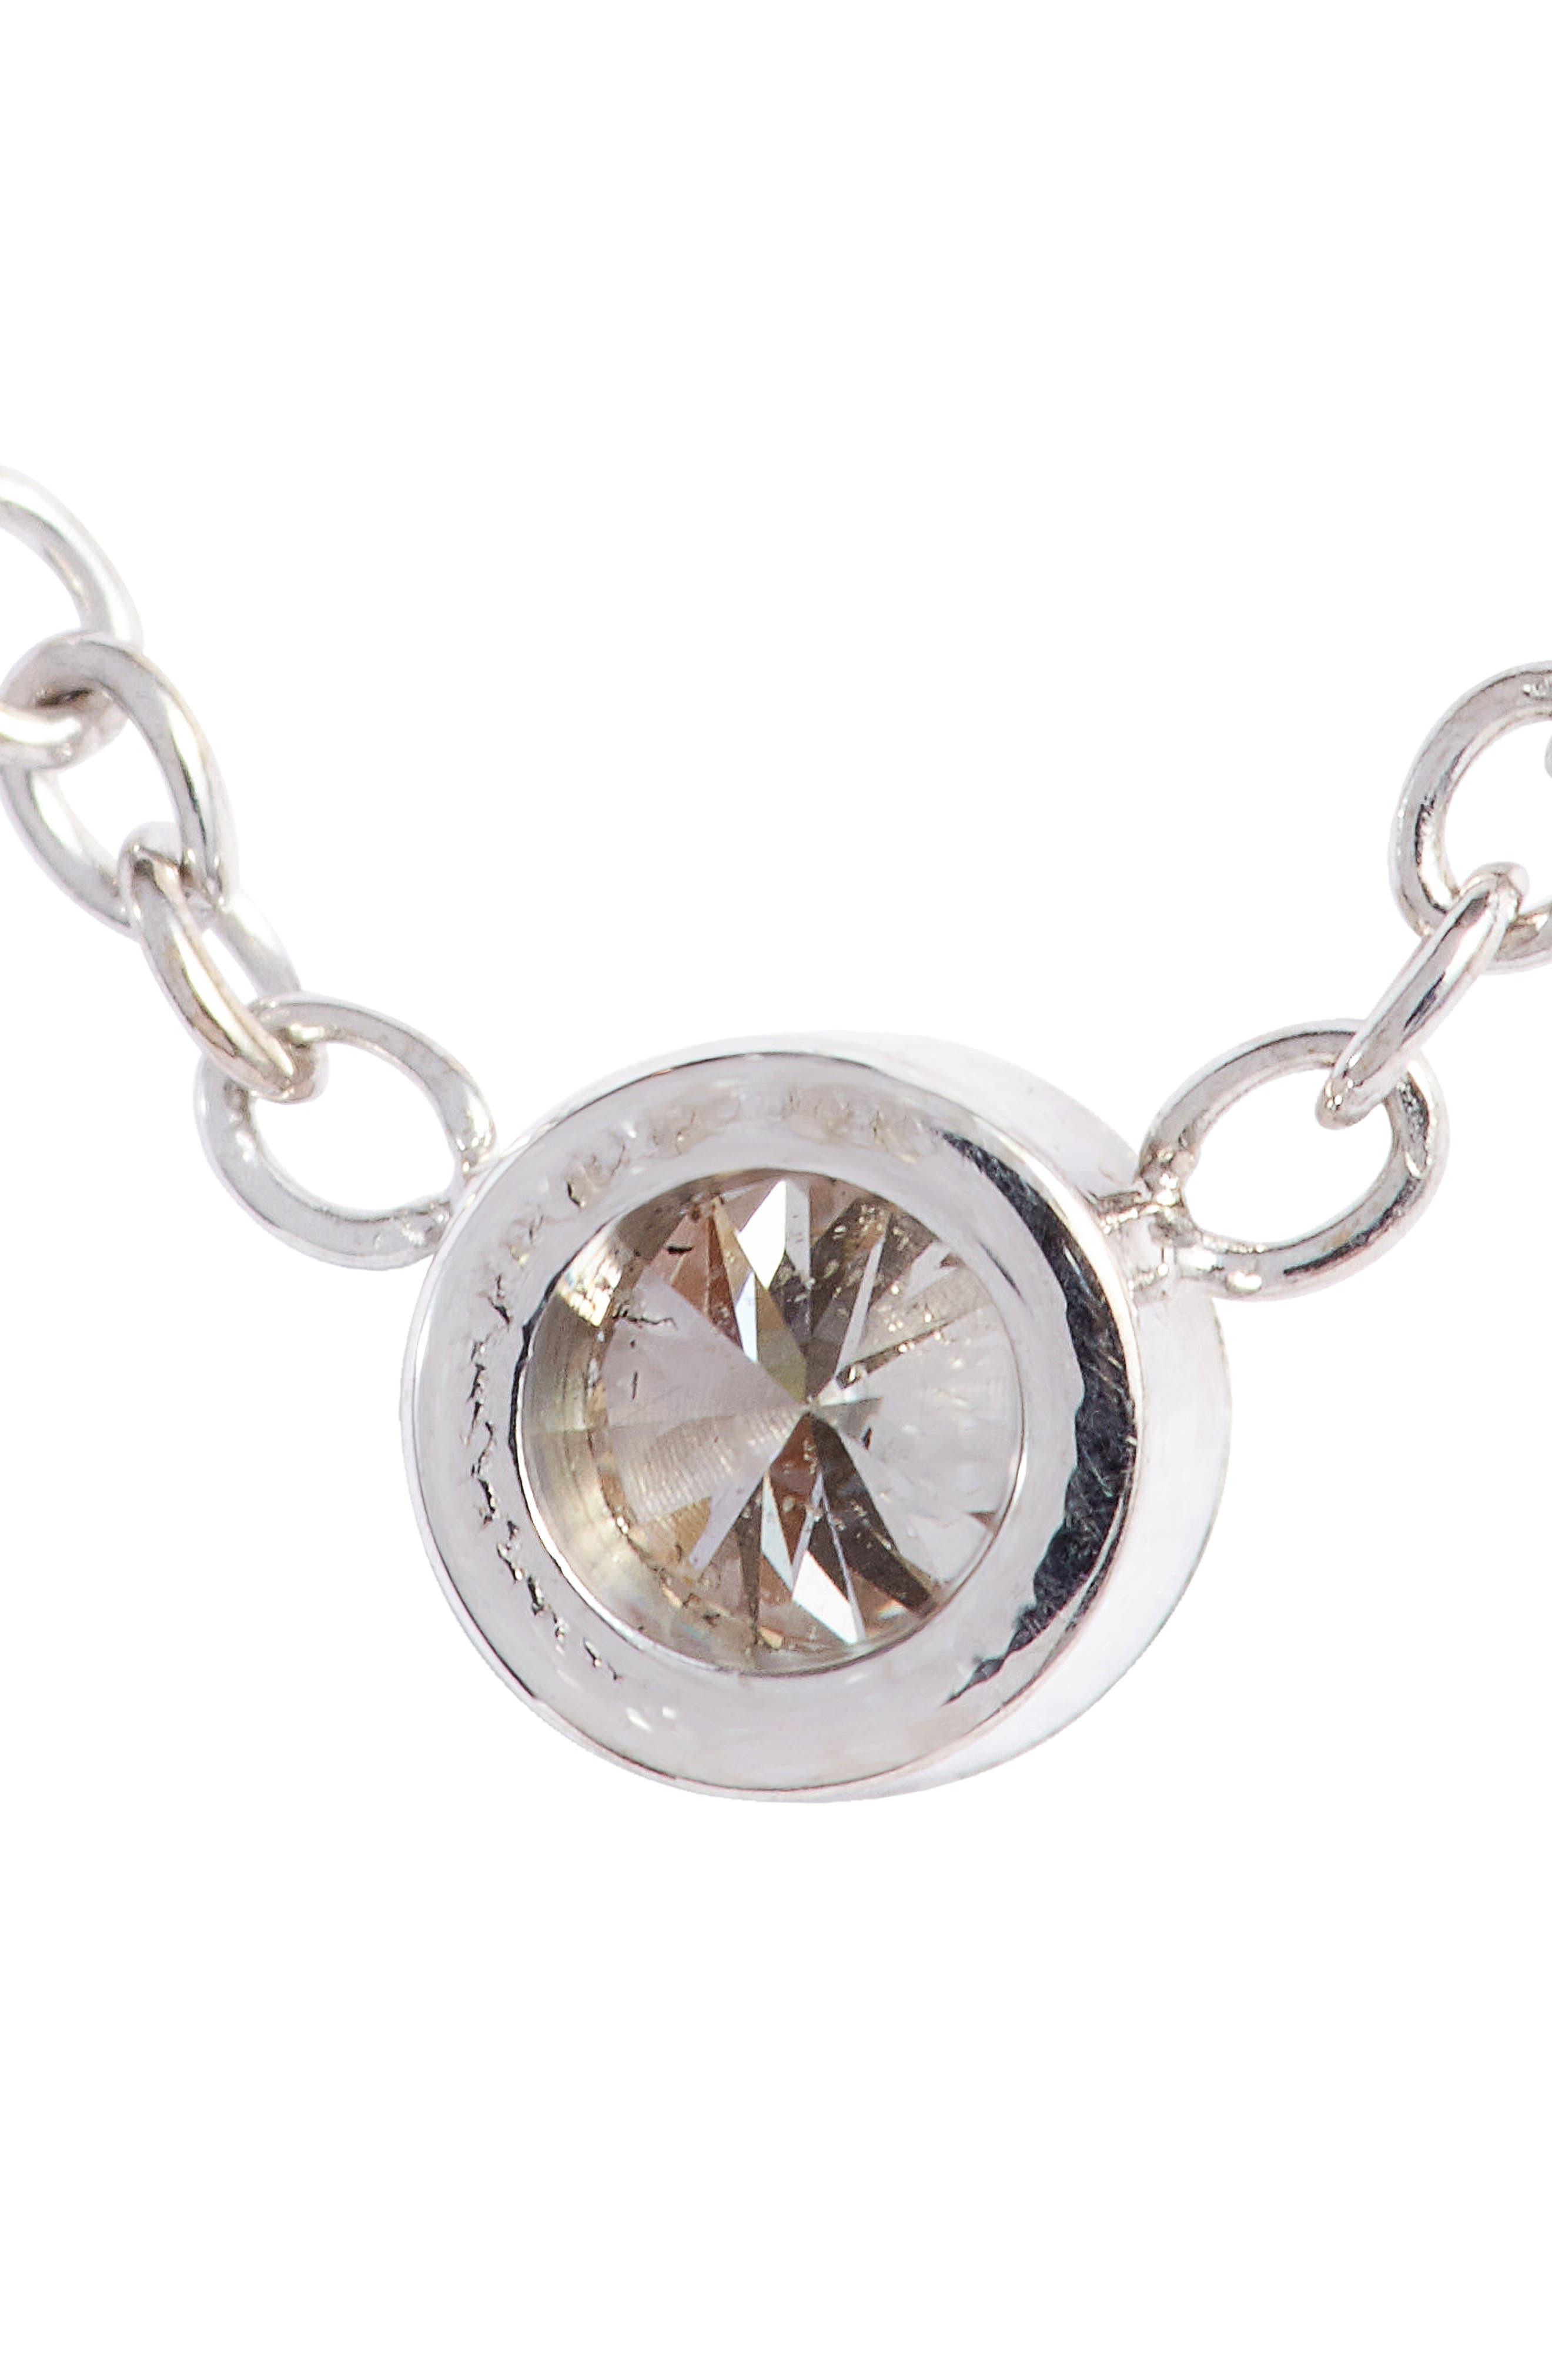 Diamond Bezel Pendant Necklace,                             Alternate thumbnail 6, color,                             WHITE GOLD